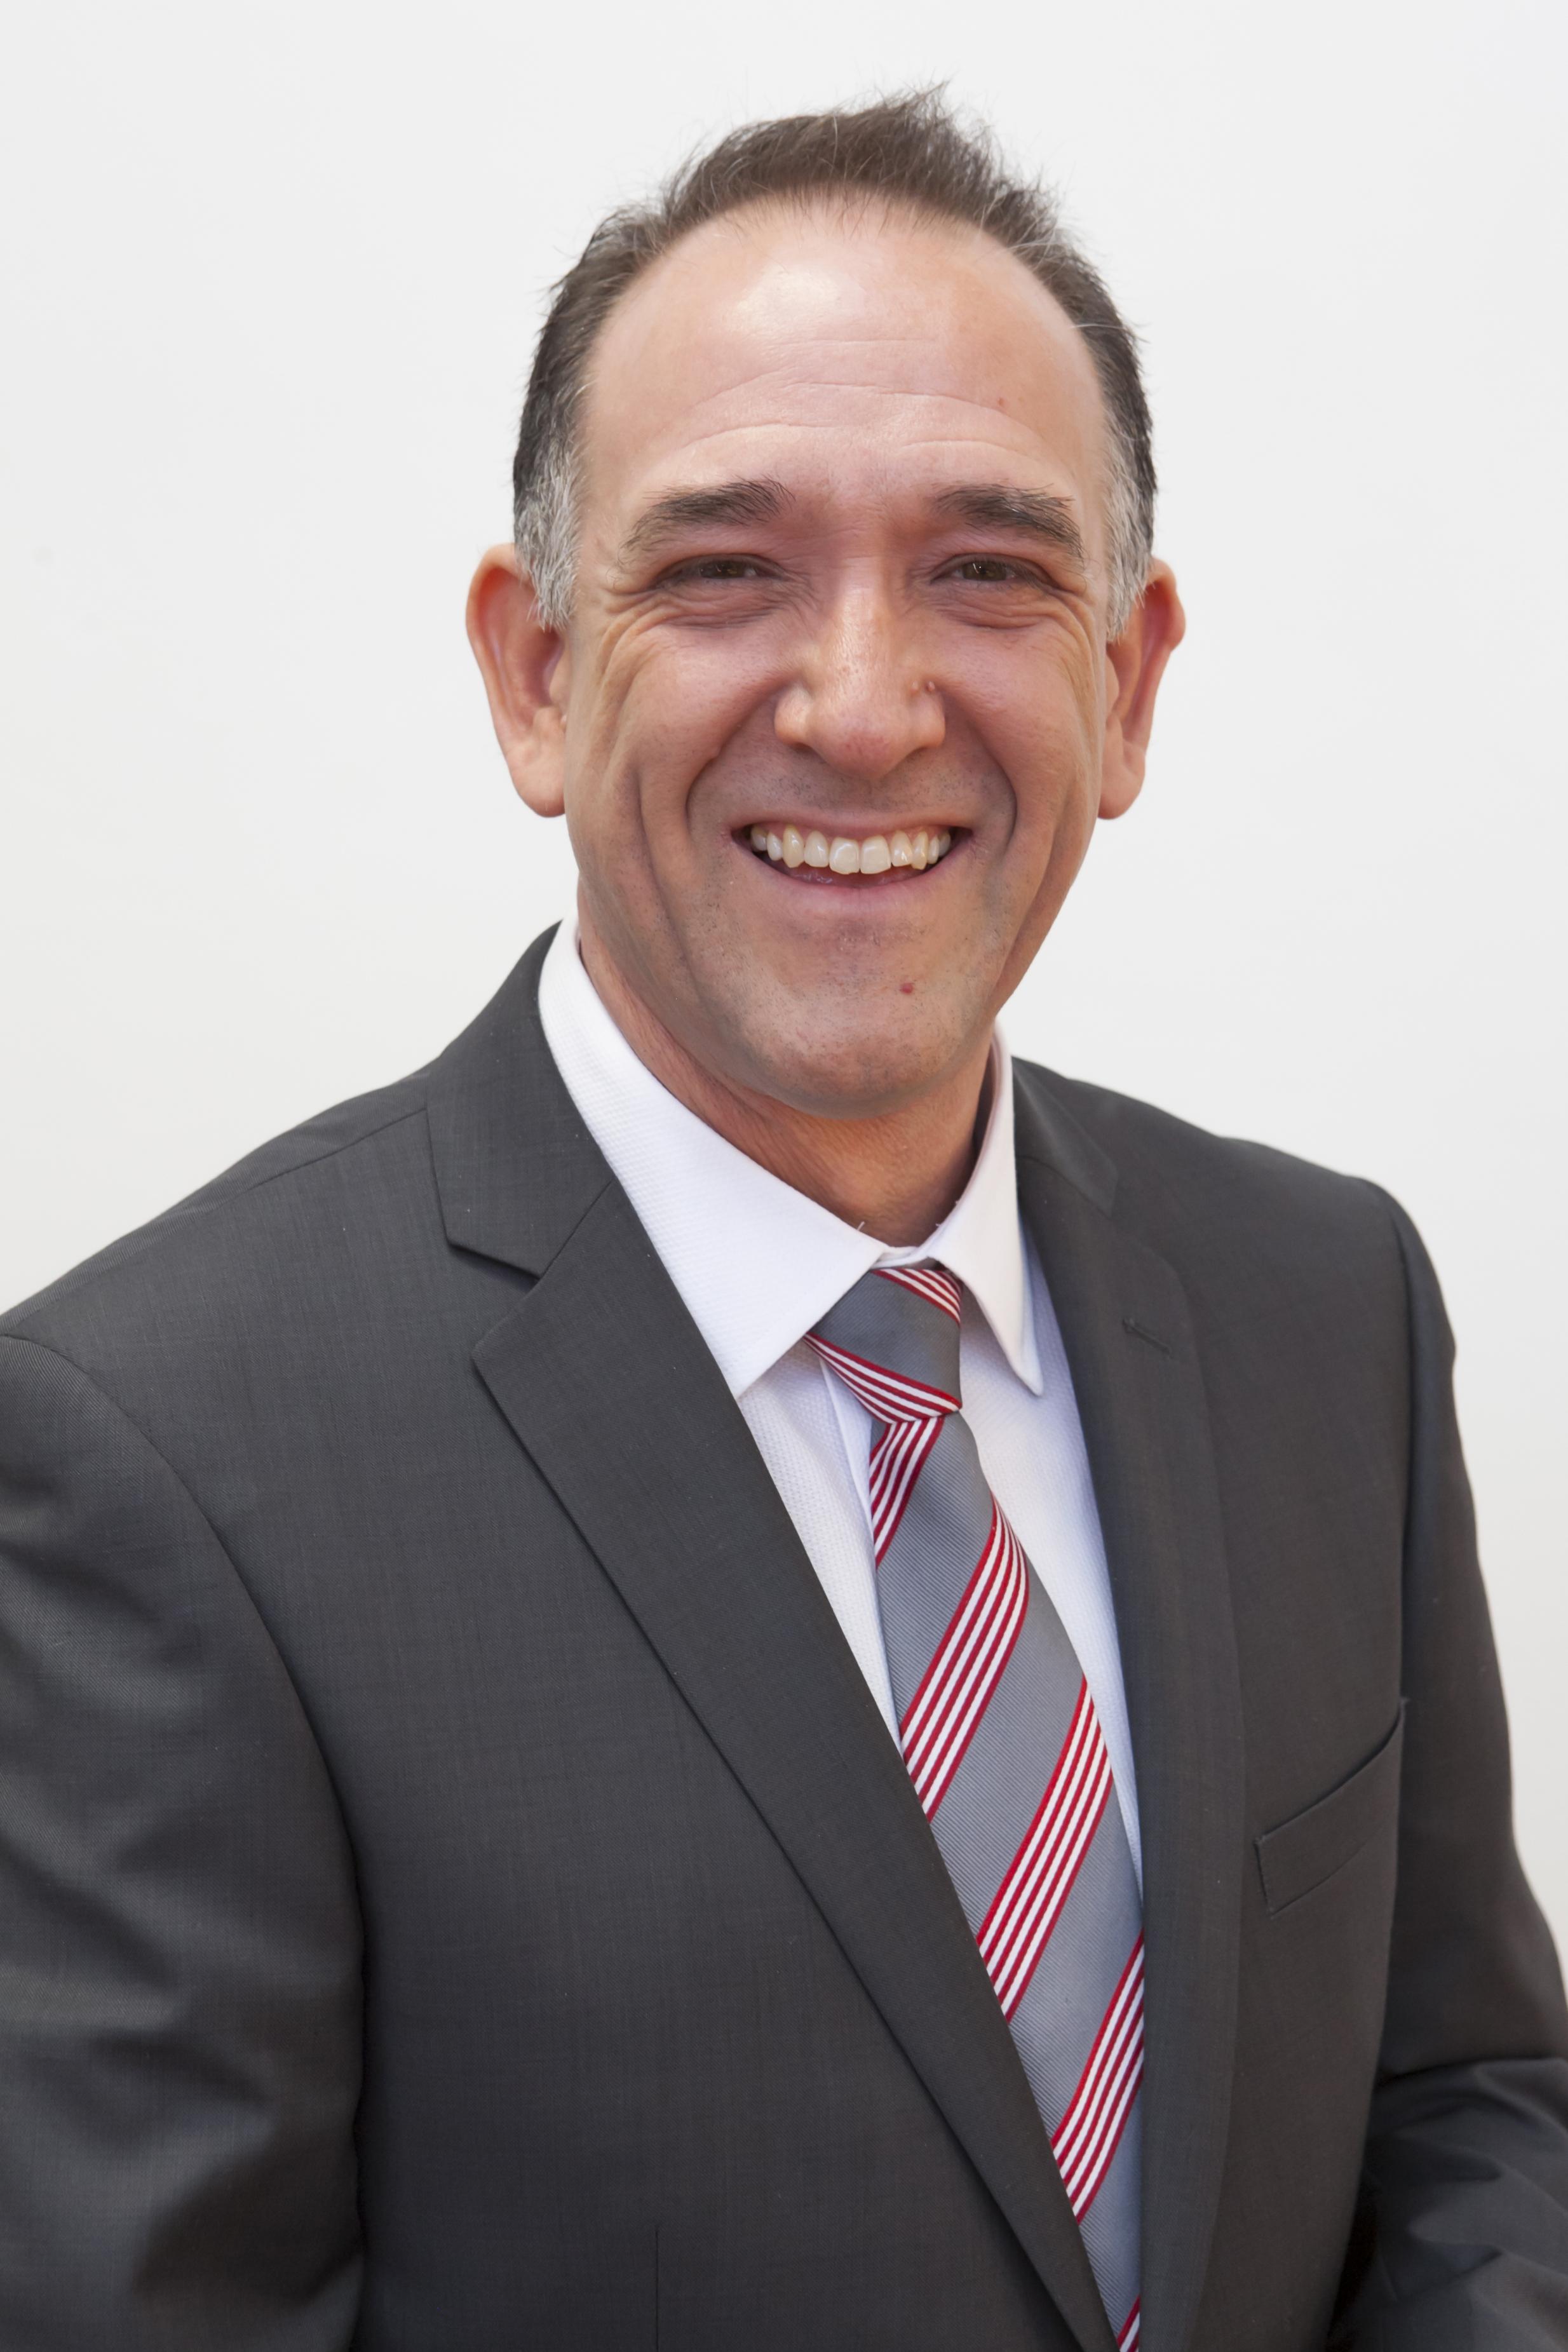 Craig Randazzo